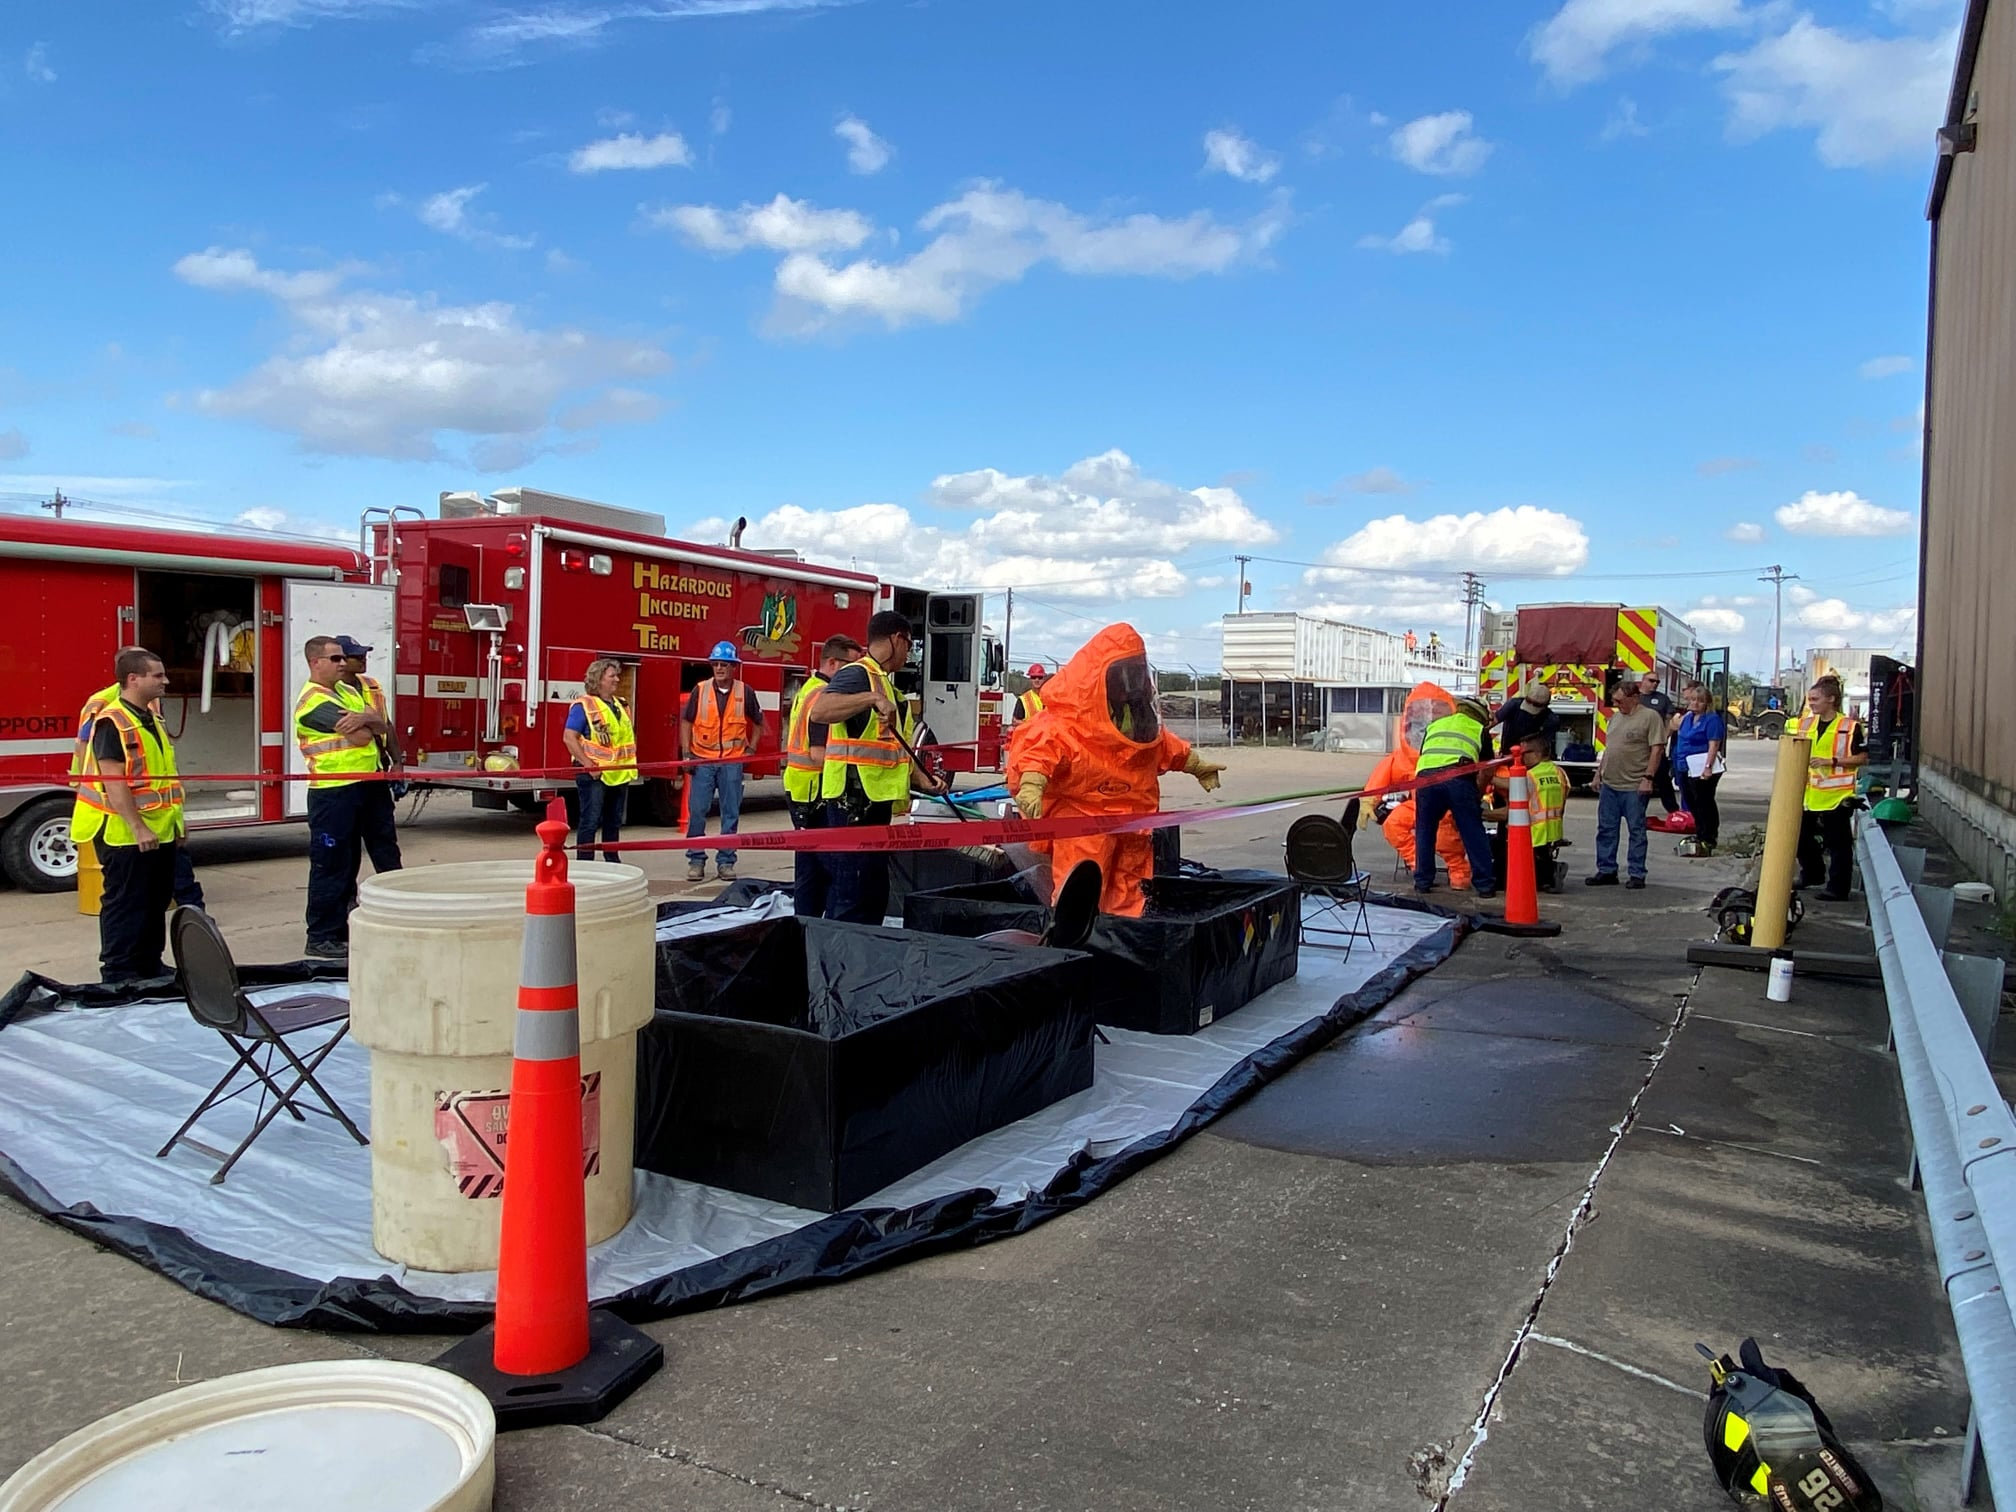 Burlington (IA) Fire Department Trains for HazMat Emergency with Help Via BNSF, Amtrak